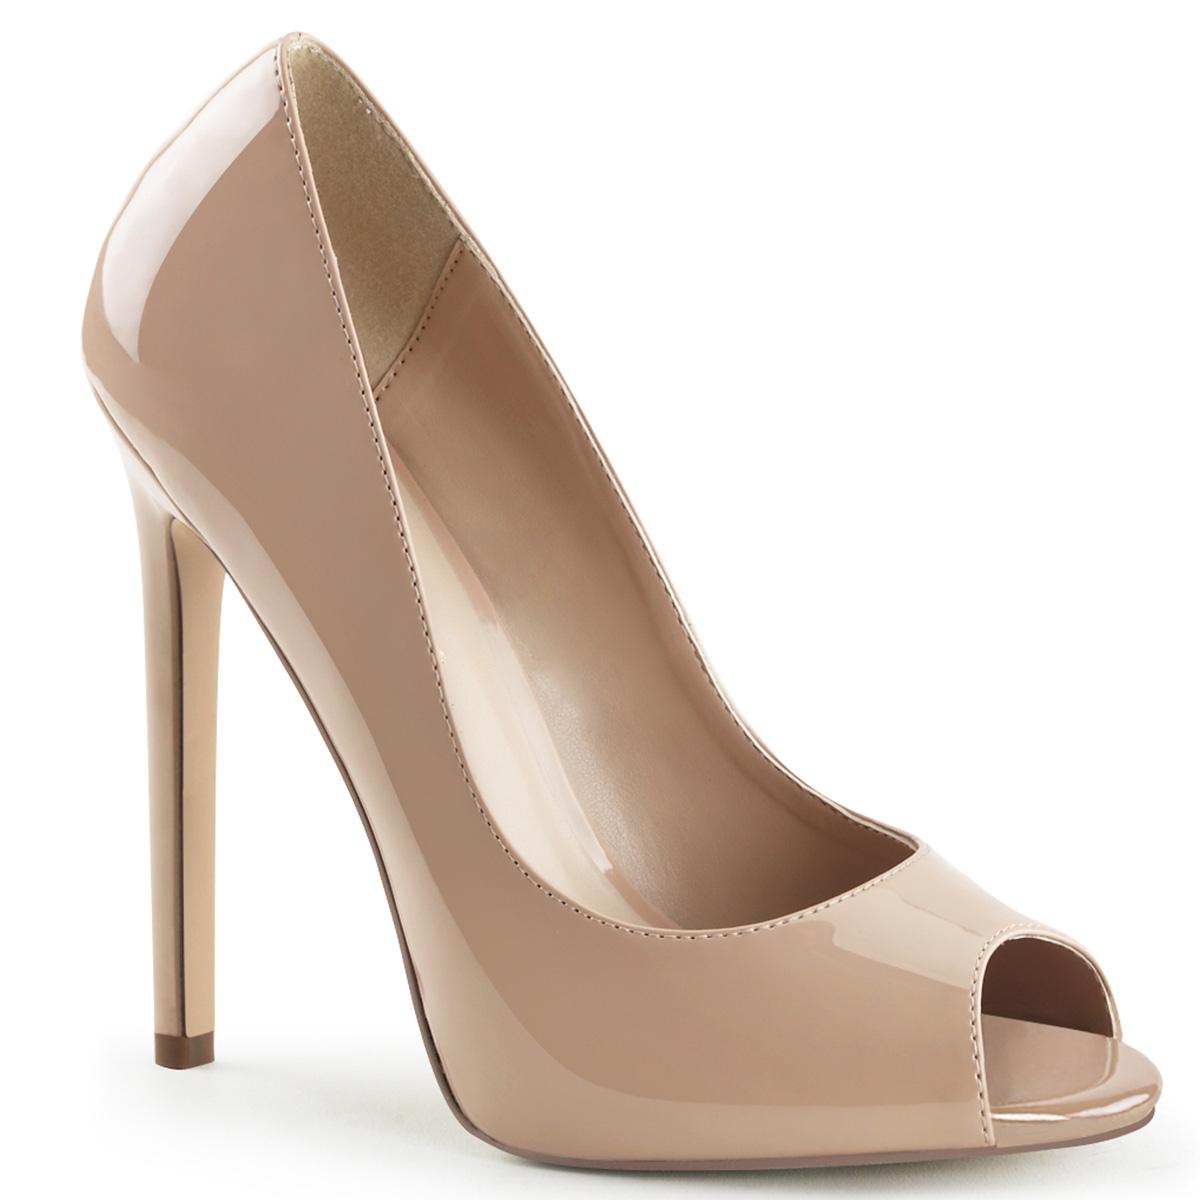 PLEASER-Womens-5-Heel-1-4-Platform-Peep-Toe-Slip-On-Stiletto-Pumps-SEXY-42